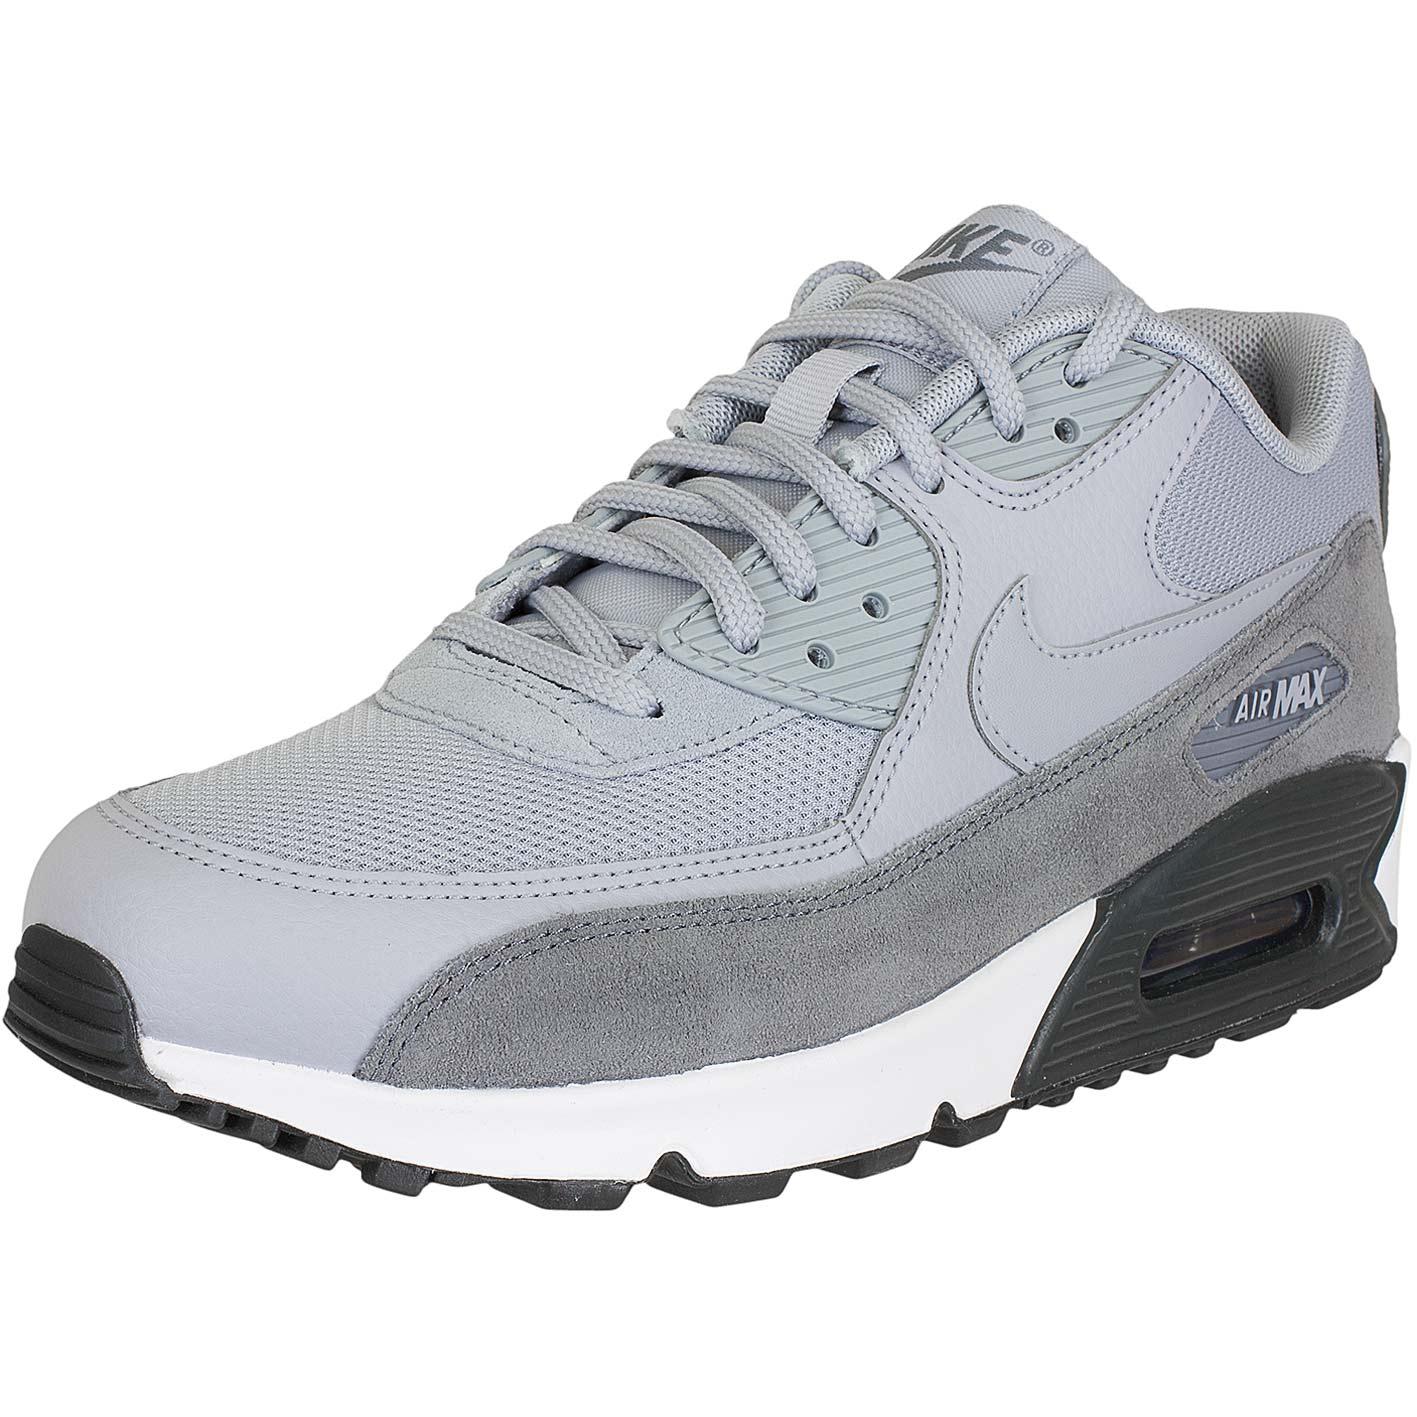 ☆ Nike Damen Sneaker Air Max 90 graugrau hier bestellen!